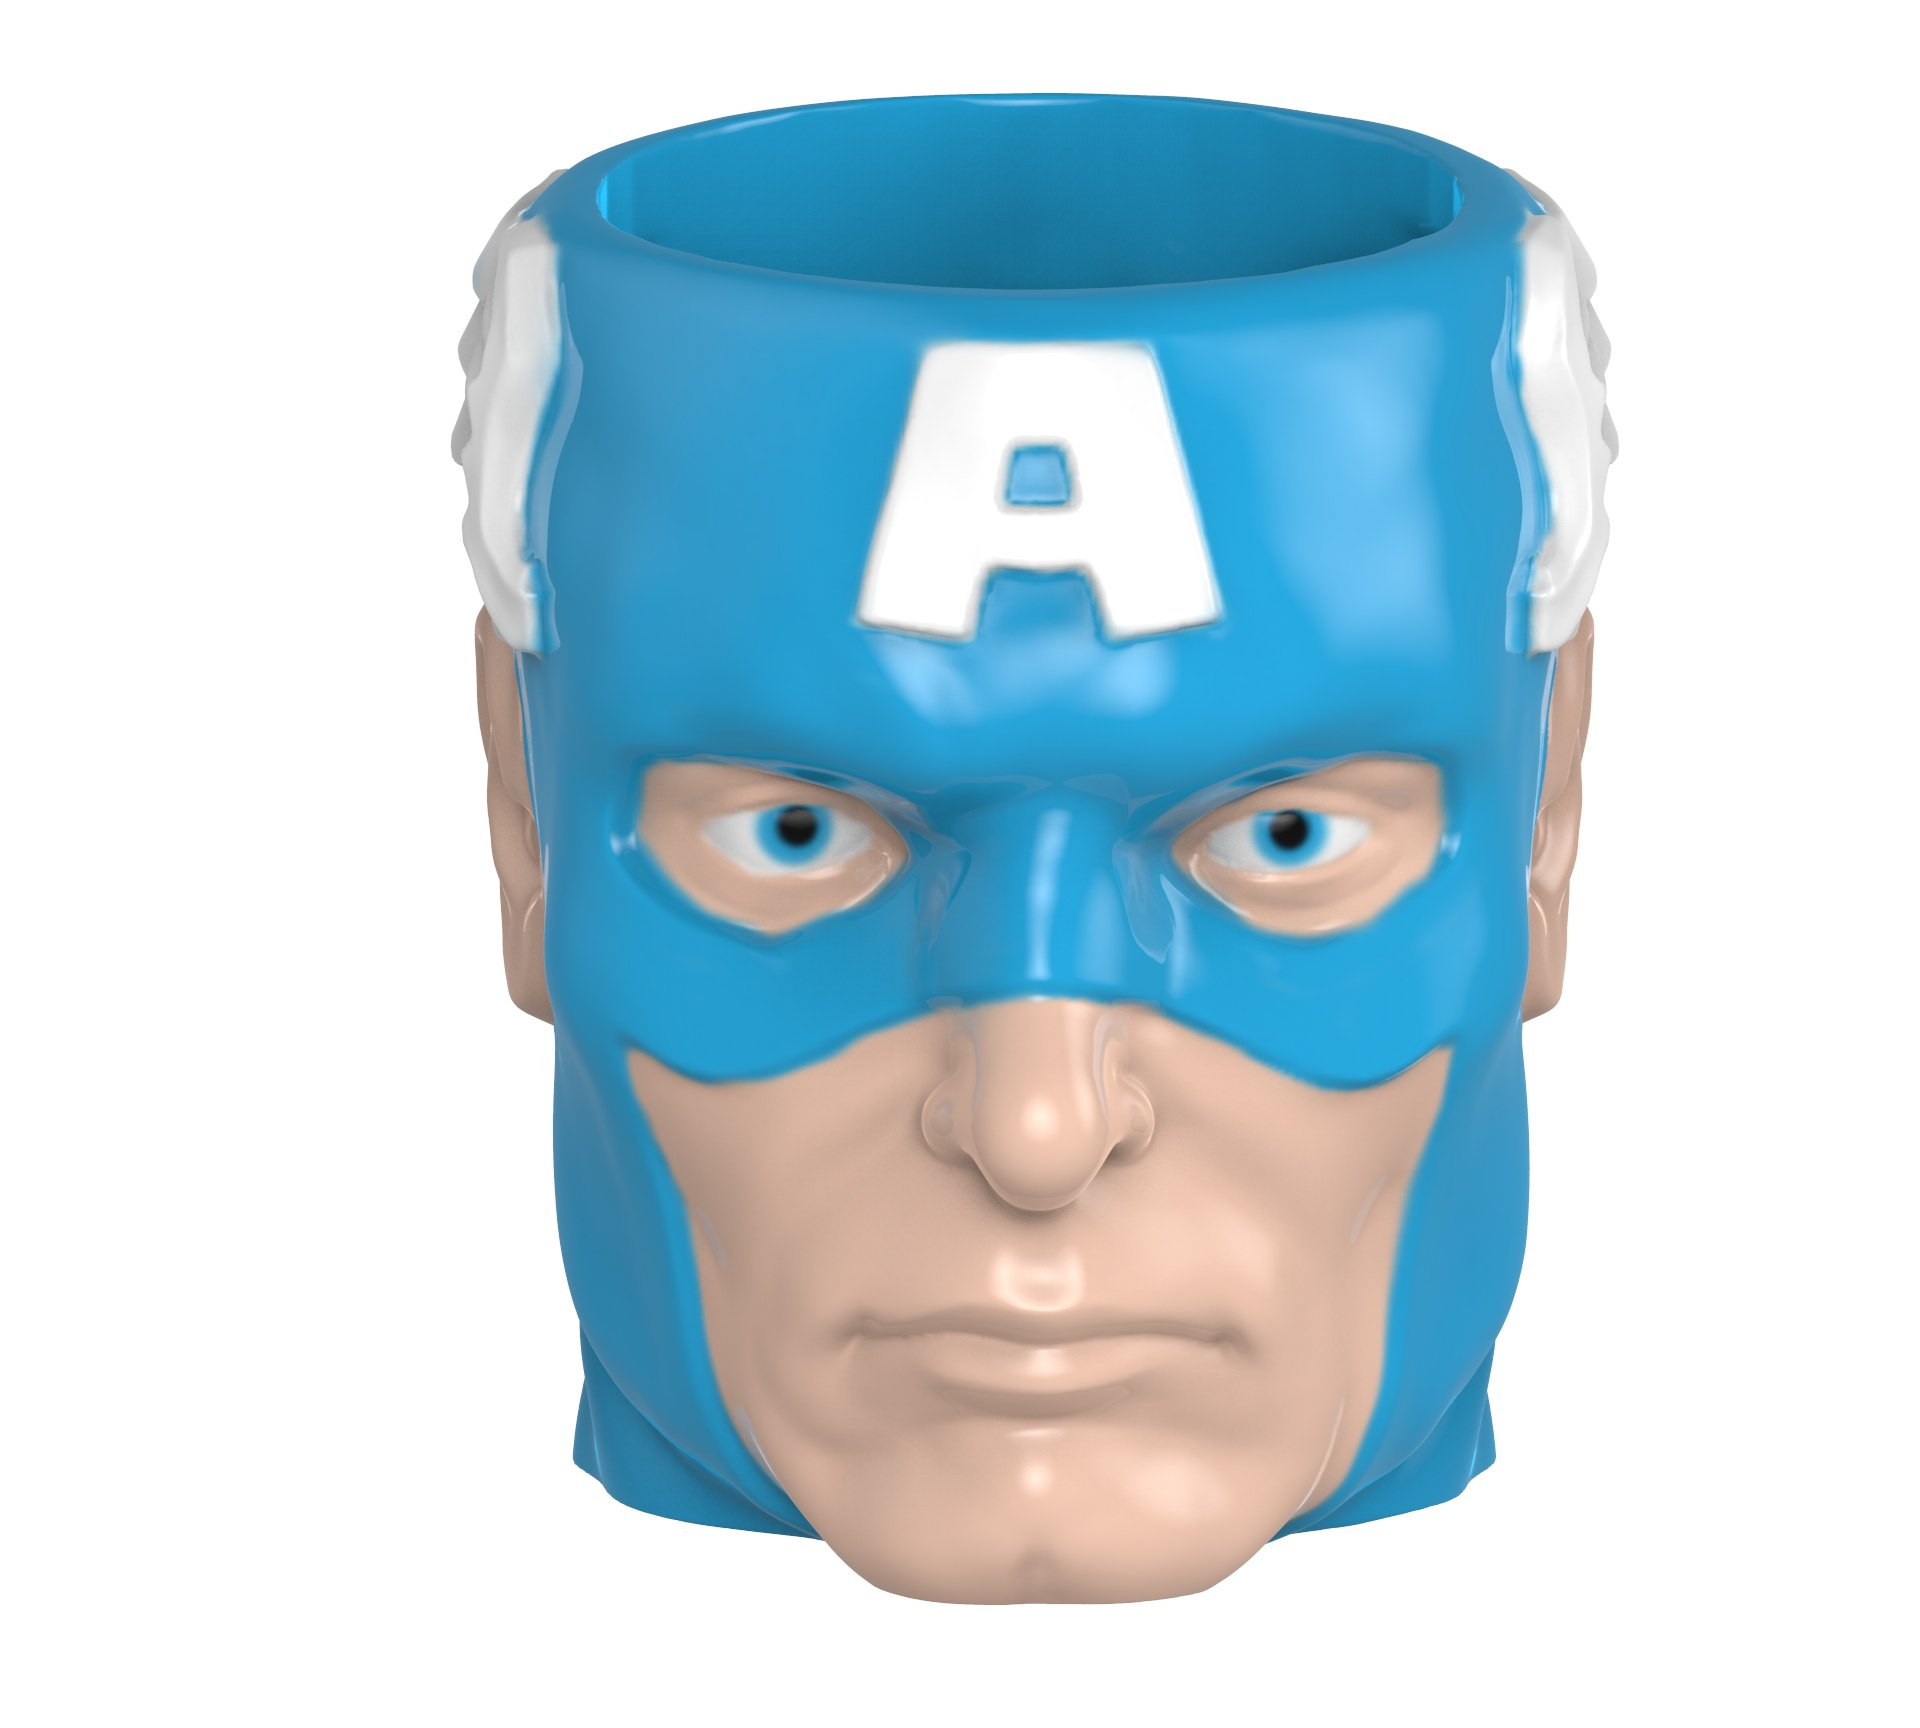 Zak Designs MRTI-8513 Marvel Comics Sculpted Ceramic Coffee Cup, Captain America by Zak Designs (Image #1)